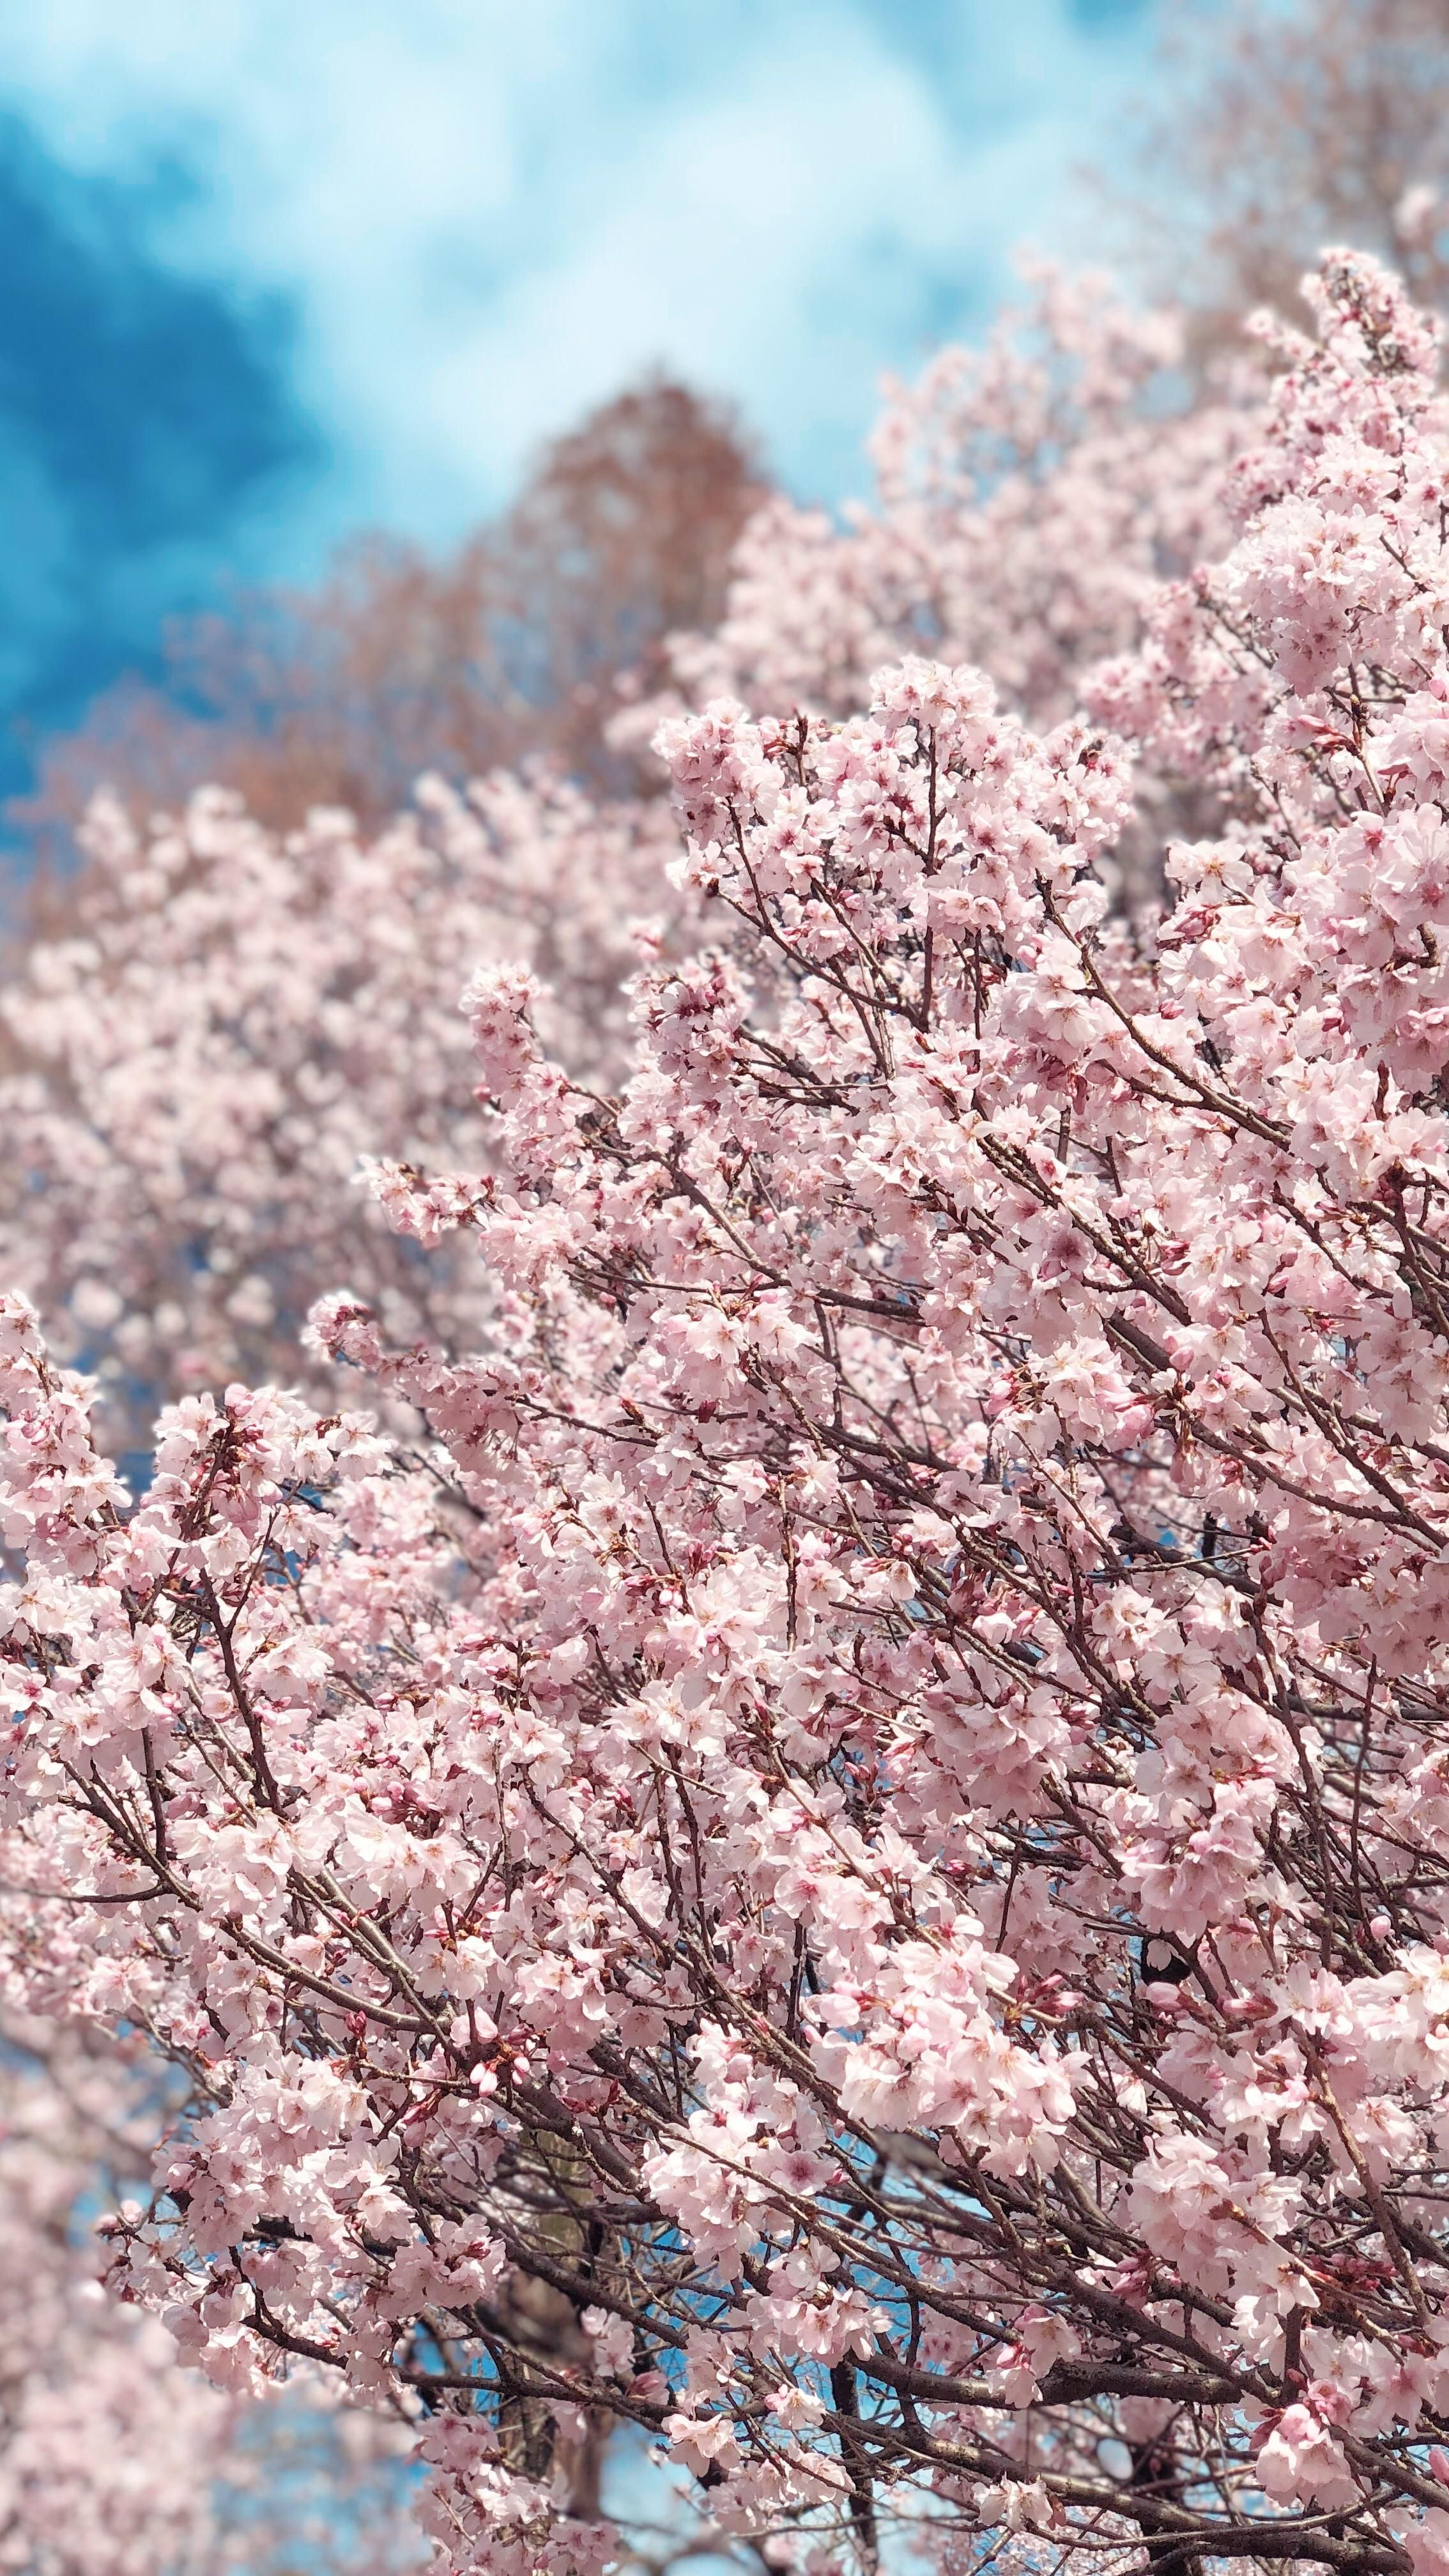 Cherry Blossom In Full Bloom Cherry Blooms Cherry Blossom Blossom